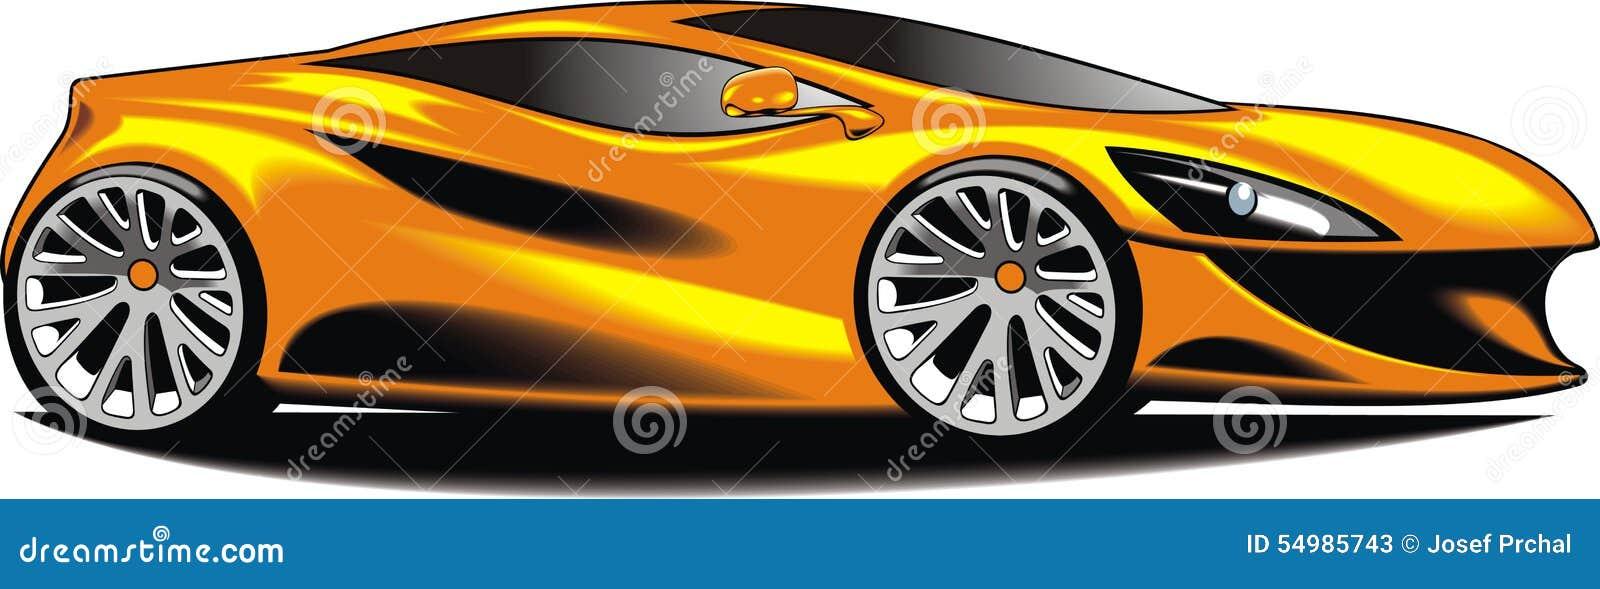 Min original- bildesign